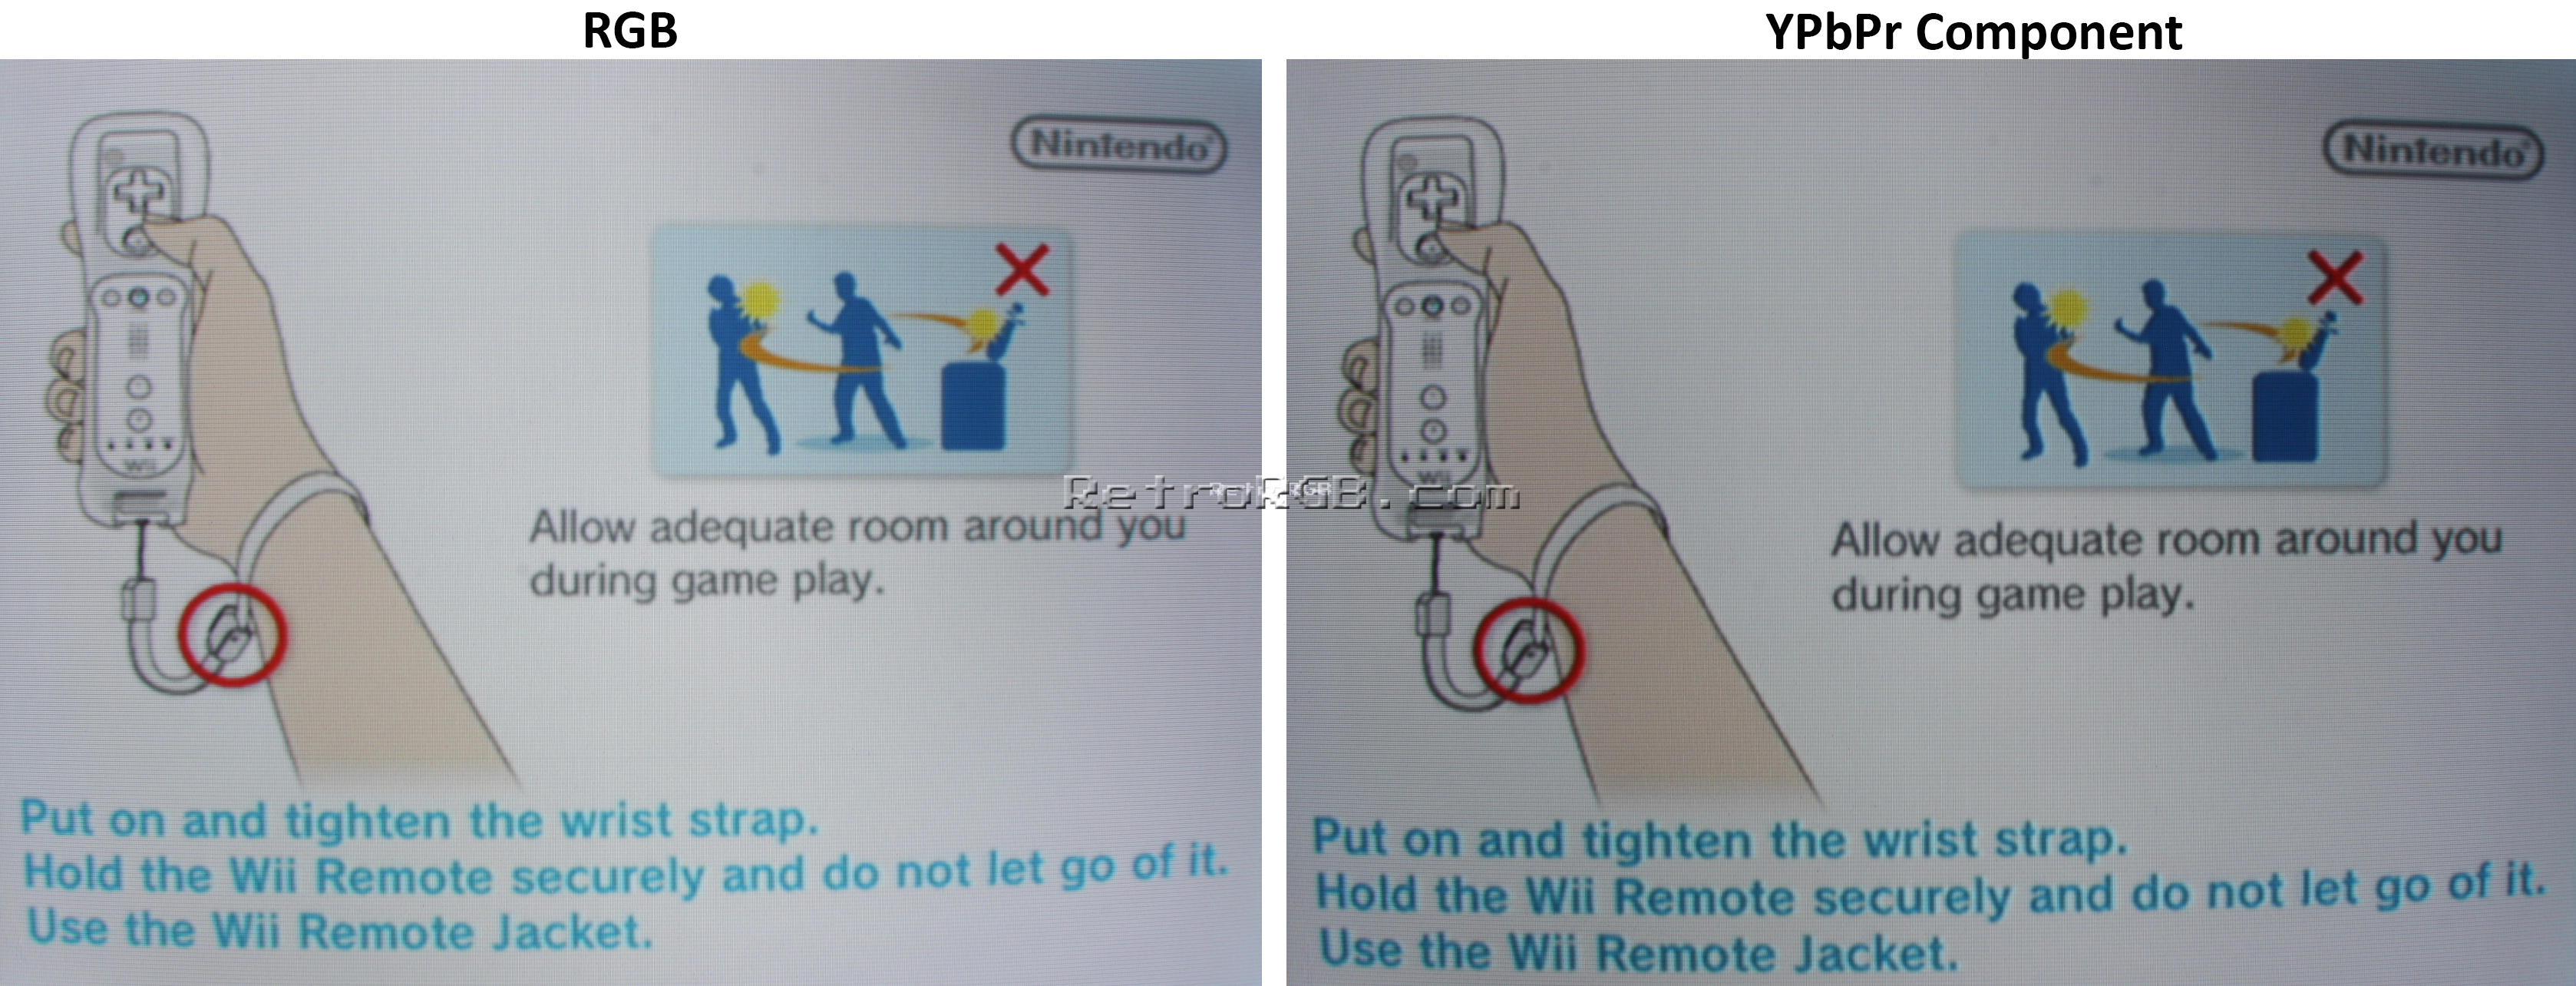 RetroRGB - Wii RGB vs Wii Component